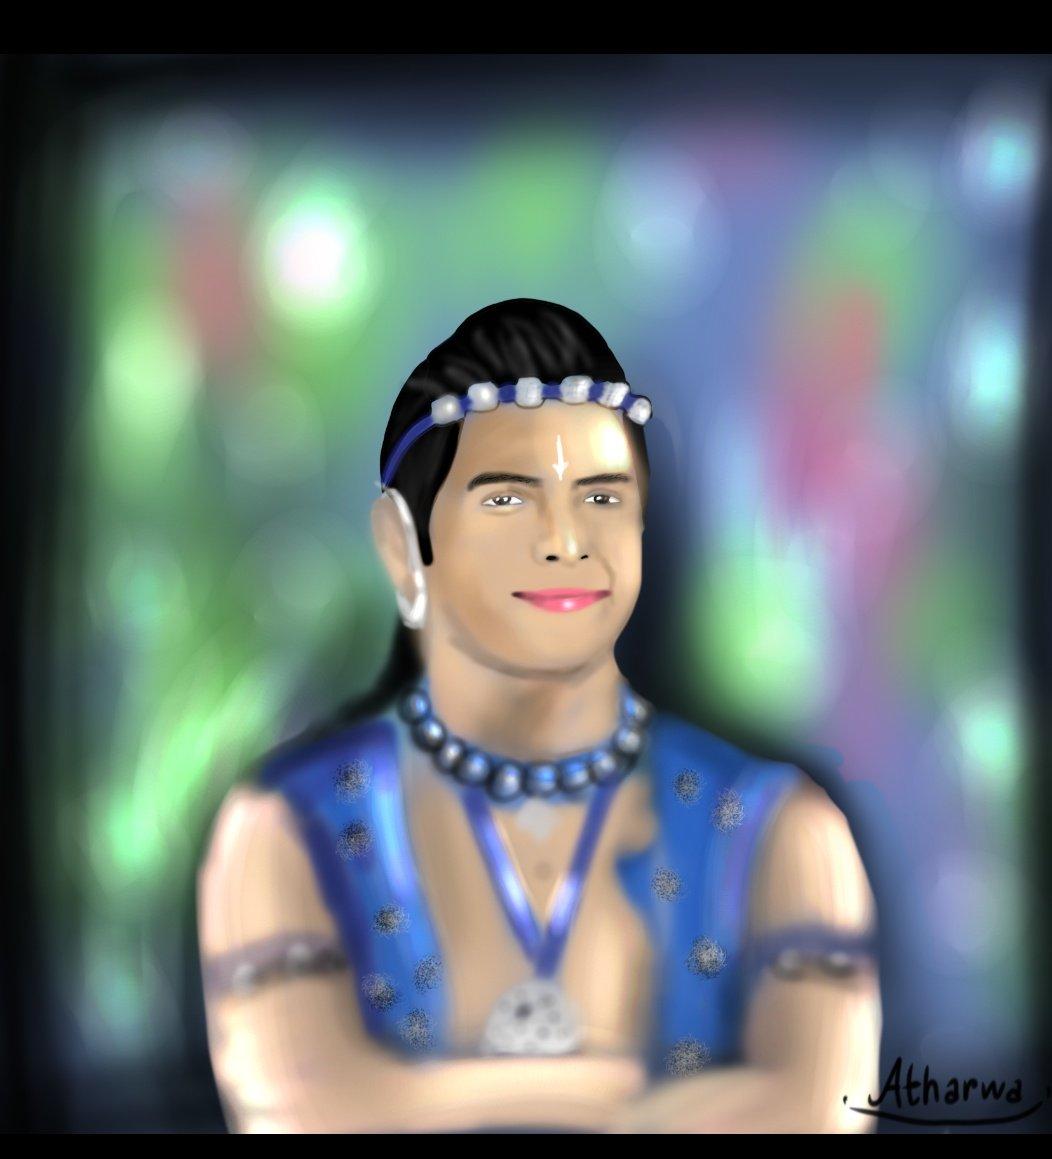 Happy birthday Dau😃 @basantb0208   Digital Illustration on mobile .....😁How is it? #RadhaKrishn